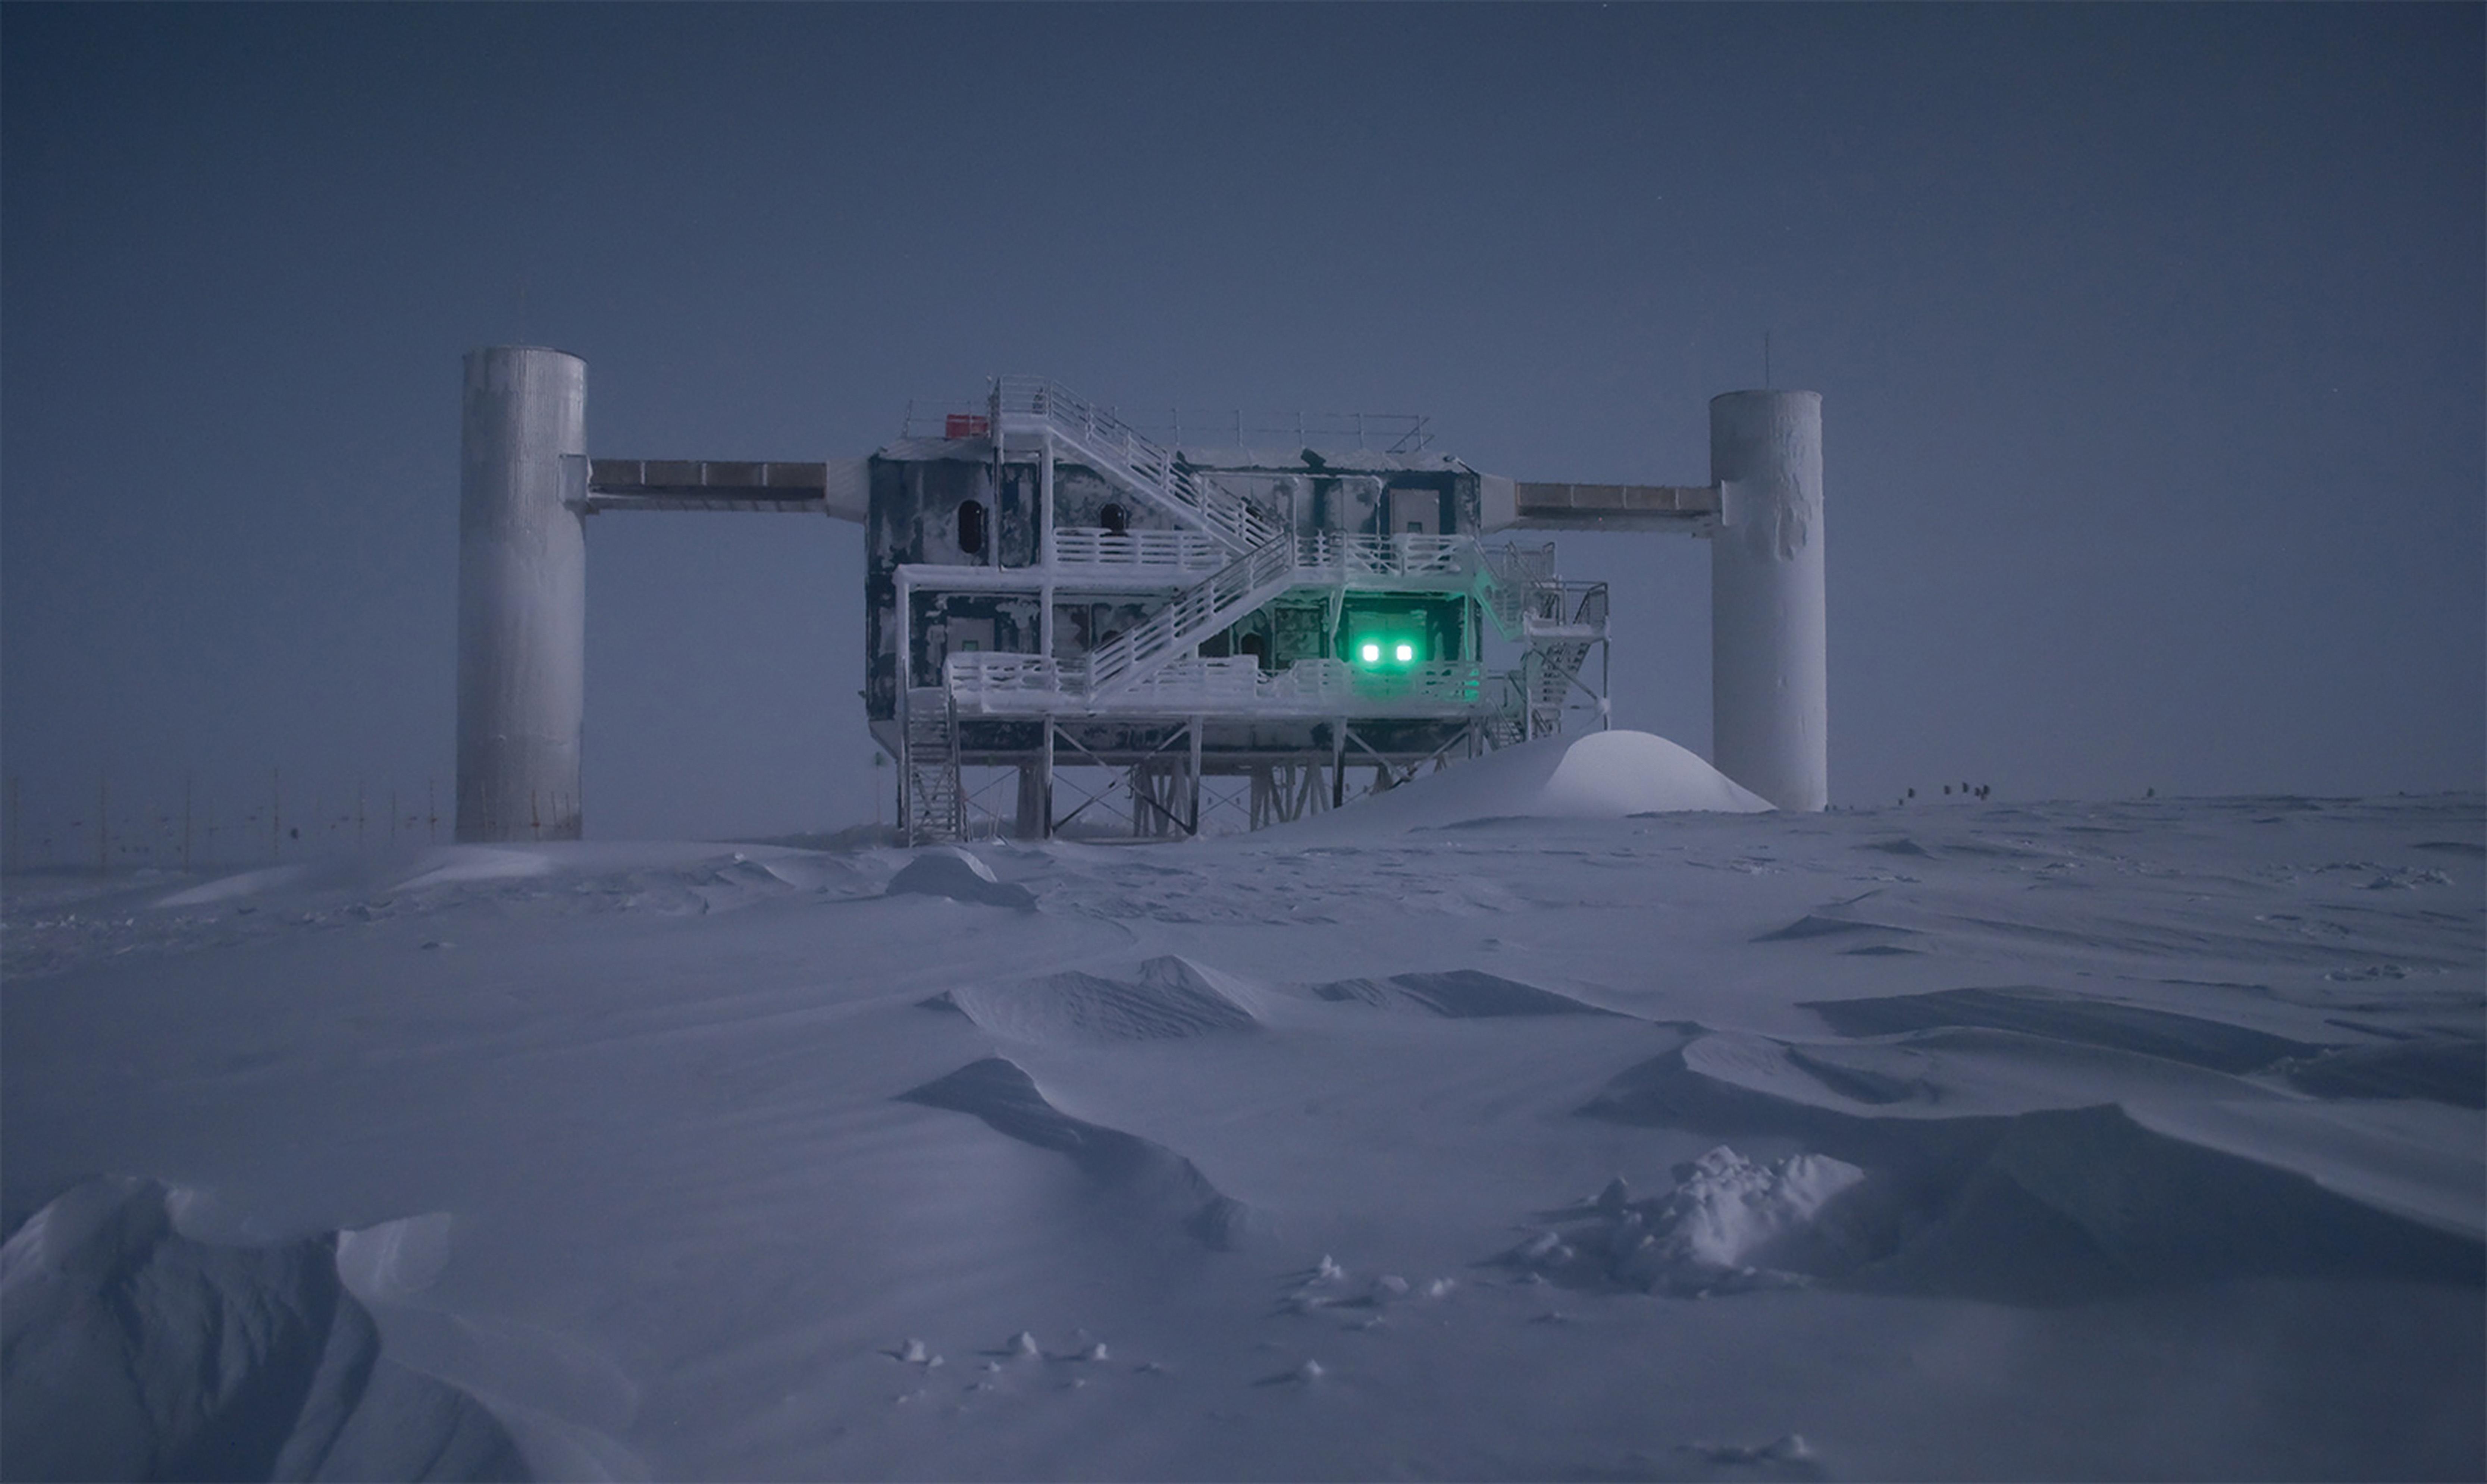 Frosty IceCube Lab in moonlight